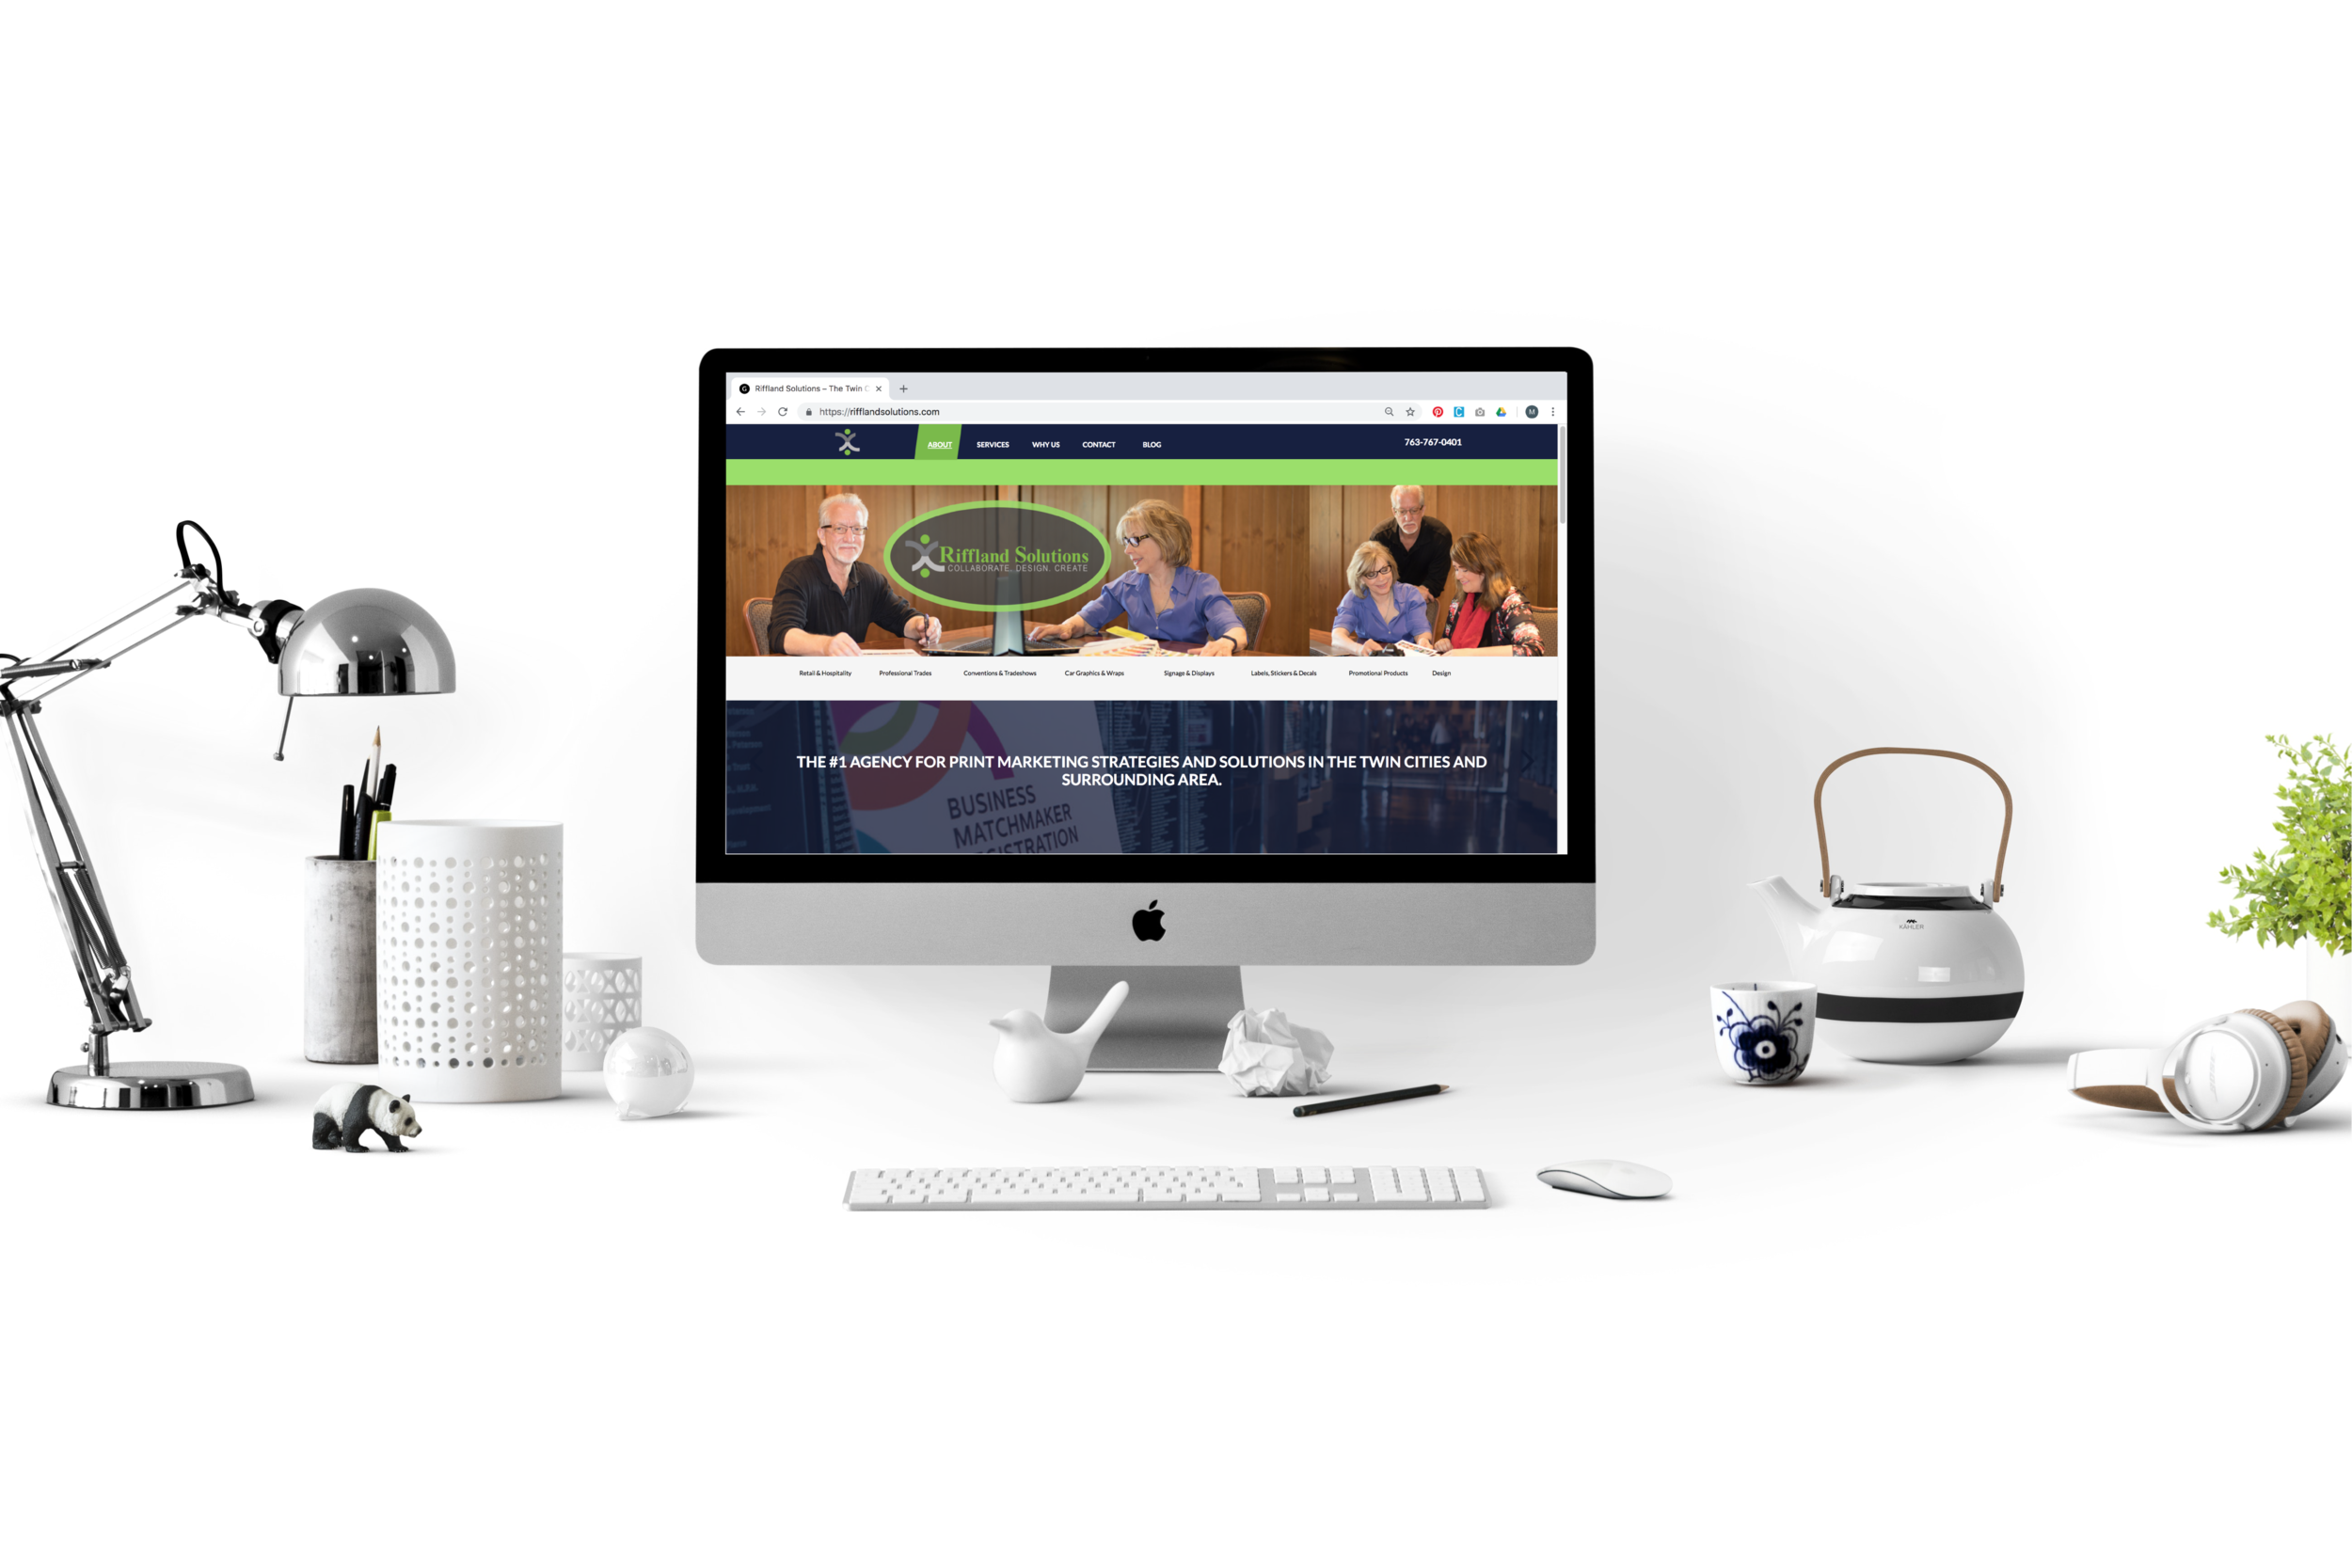 Riffland Solutions Client Spotlight